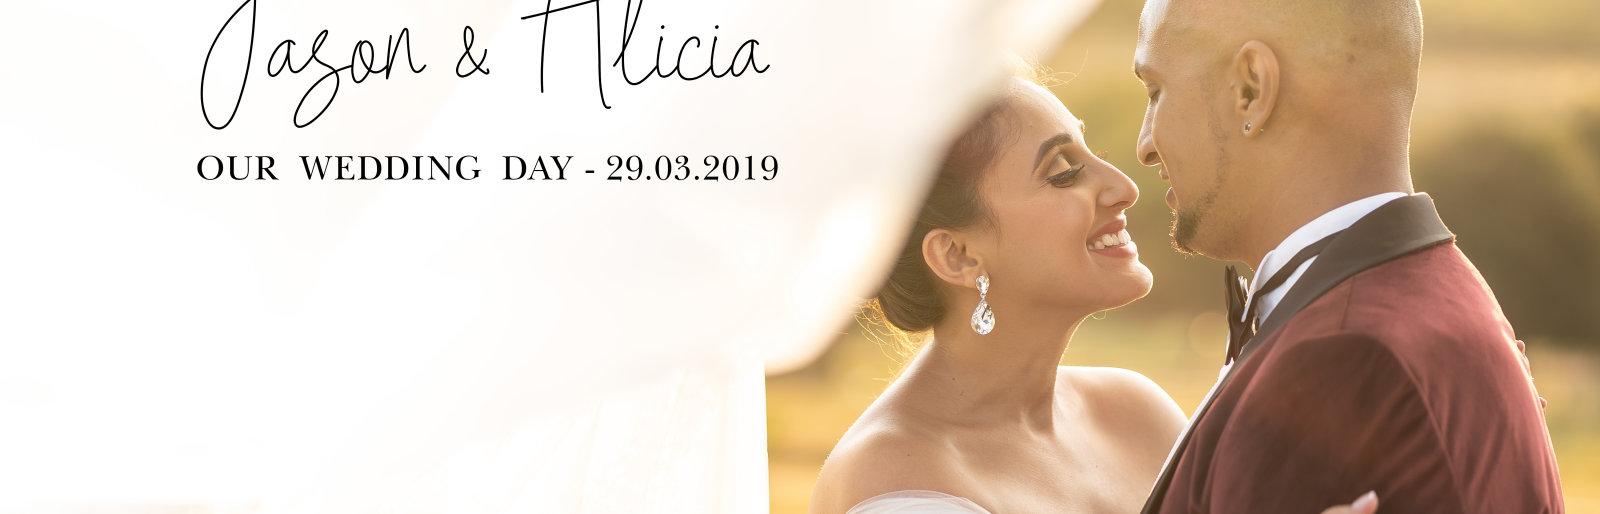 Alicia Moses